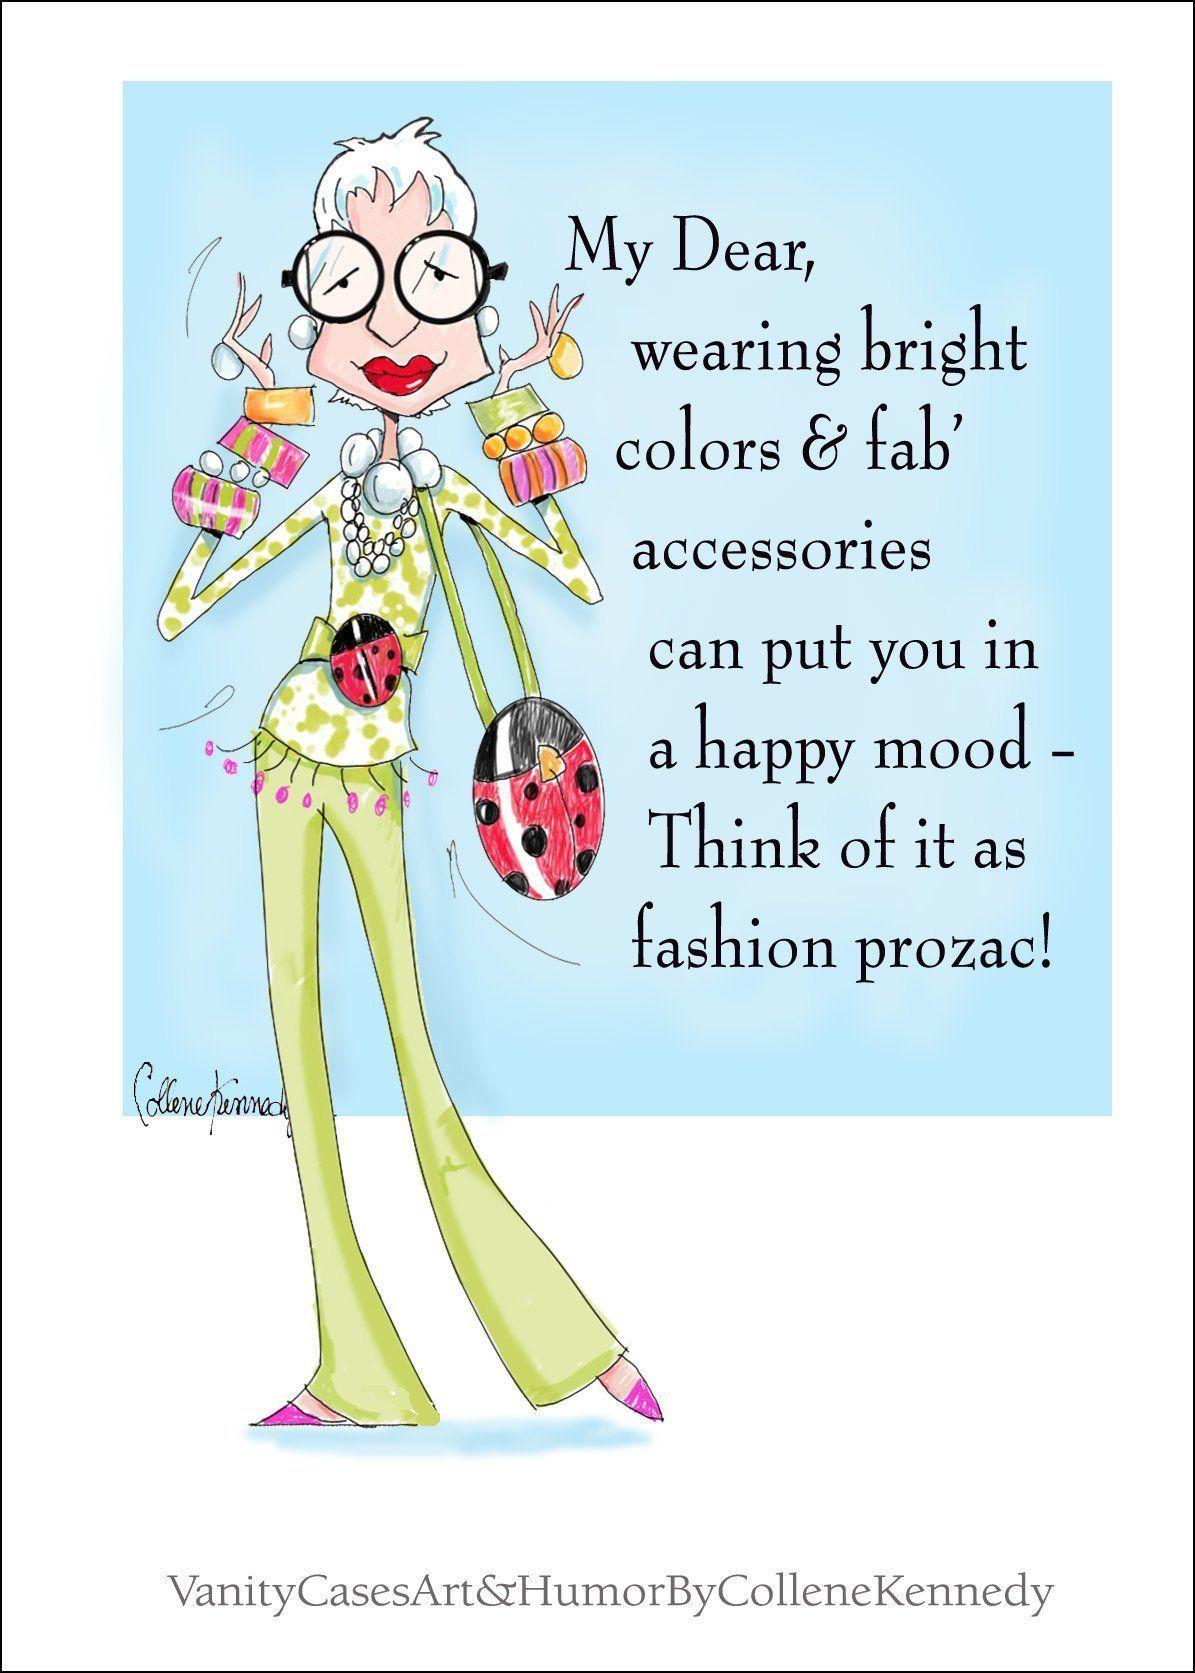 Iris Apfel Inspired Funny Fashion Birthday Card For Friend Funny Woman Birthday Card Women Hum Happy Birthday Funny Birthday Humor Birthday Cards For Friends